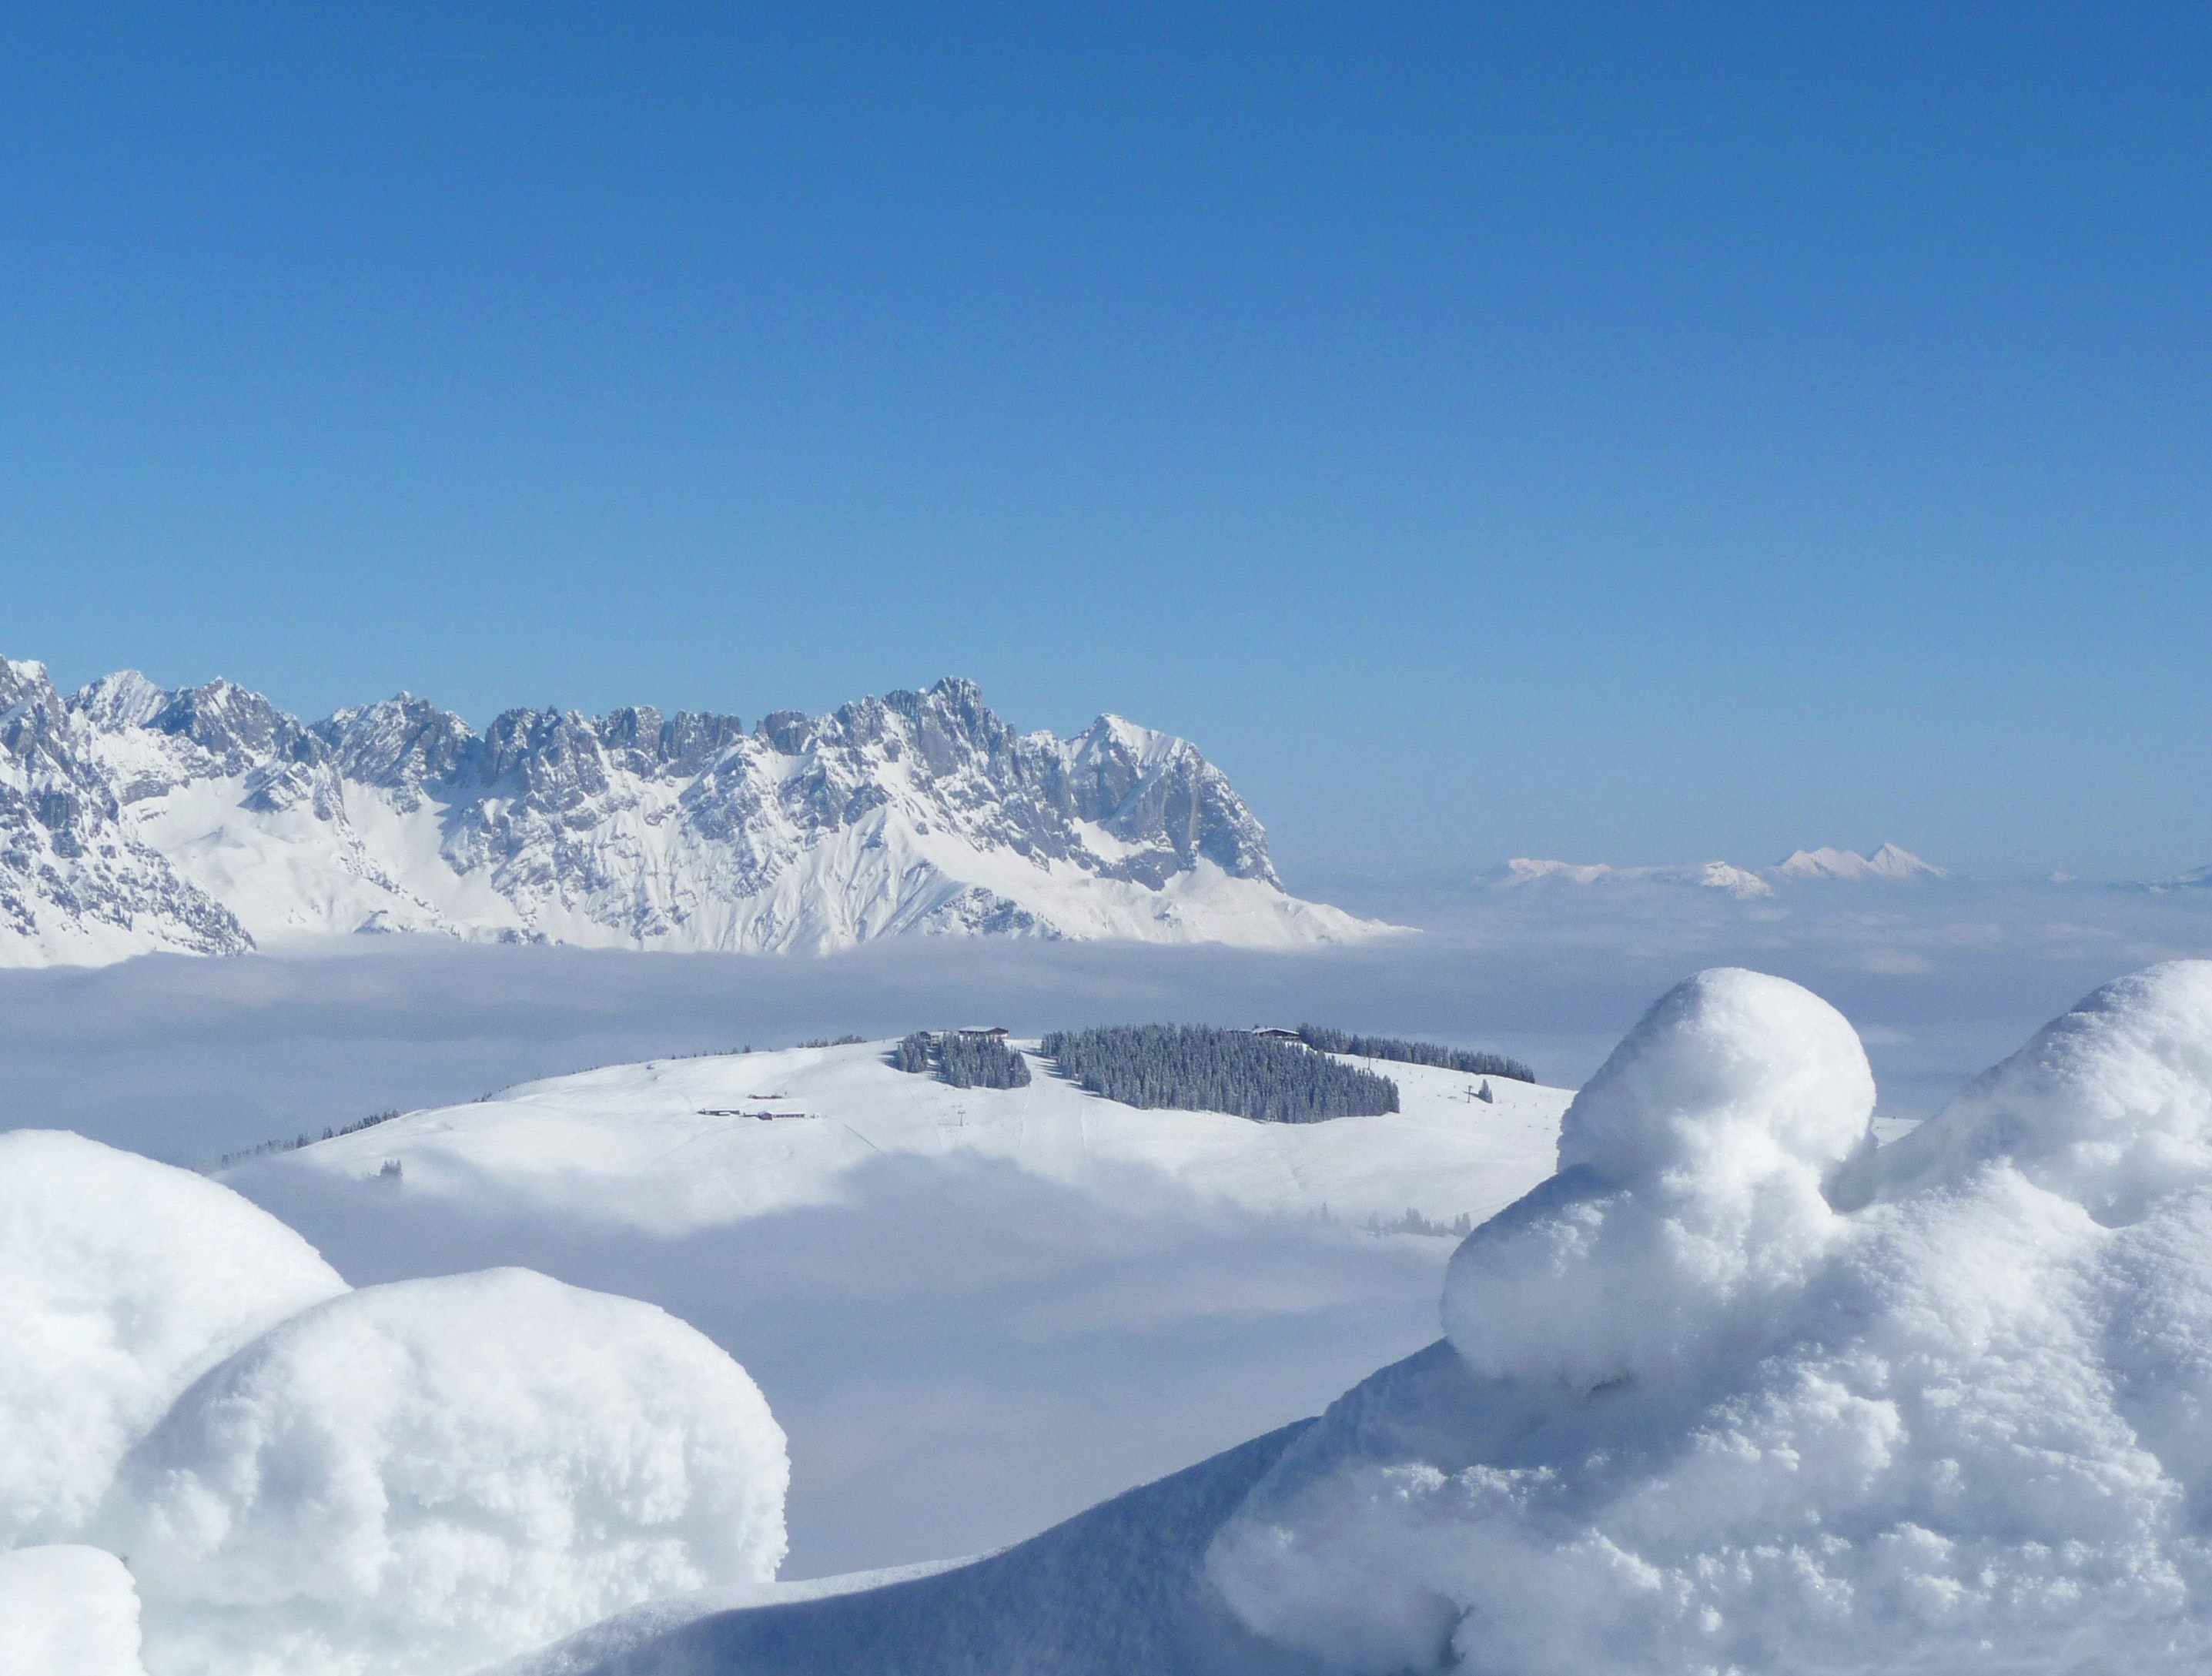 Snow Mountain Under Cloudy Sky 183 Free Stock Photo